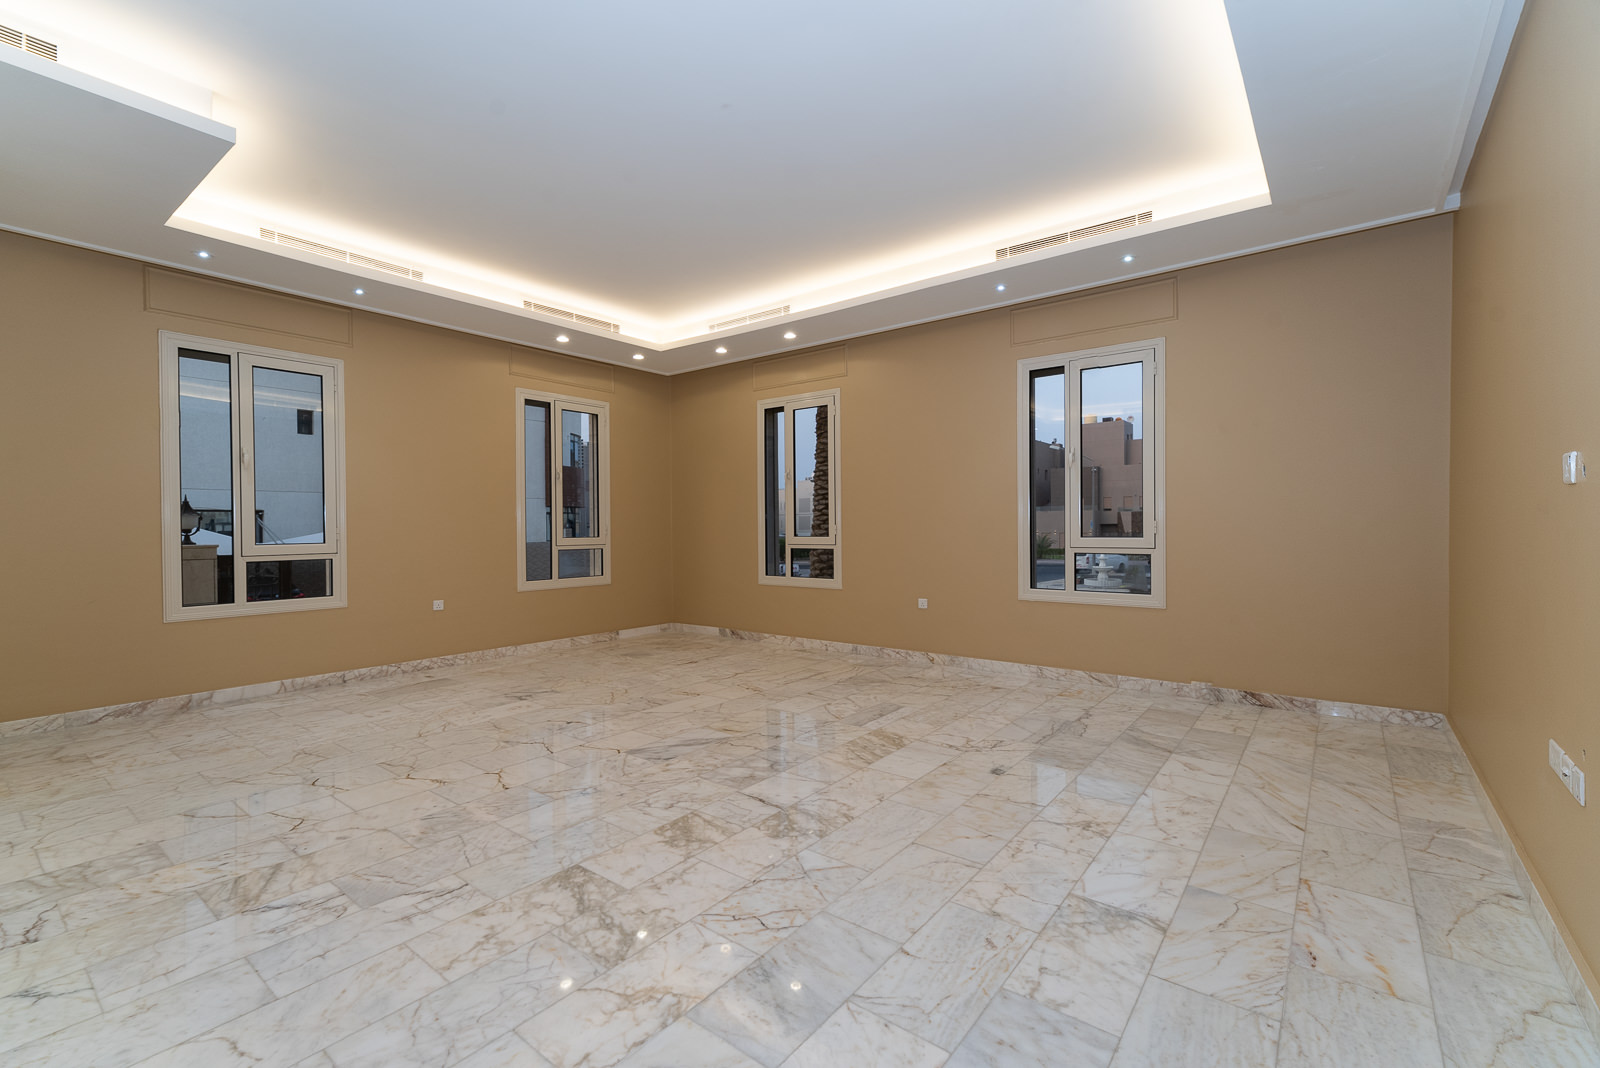 Abu Fatira – new, unfurnished, four bedroom floors